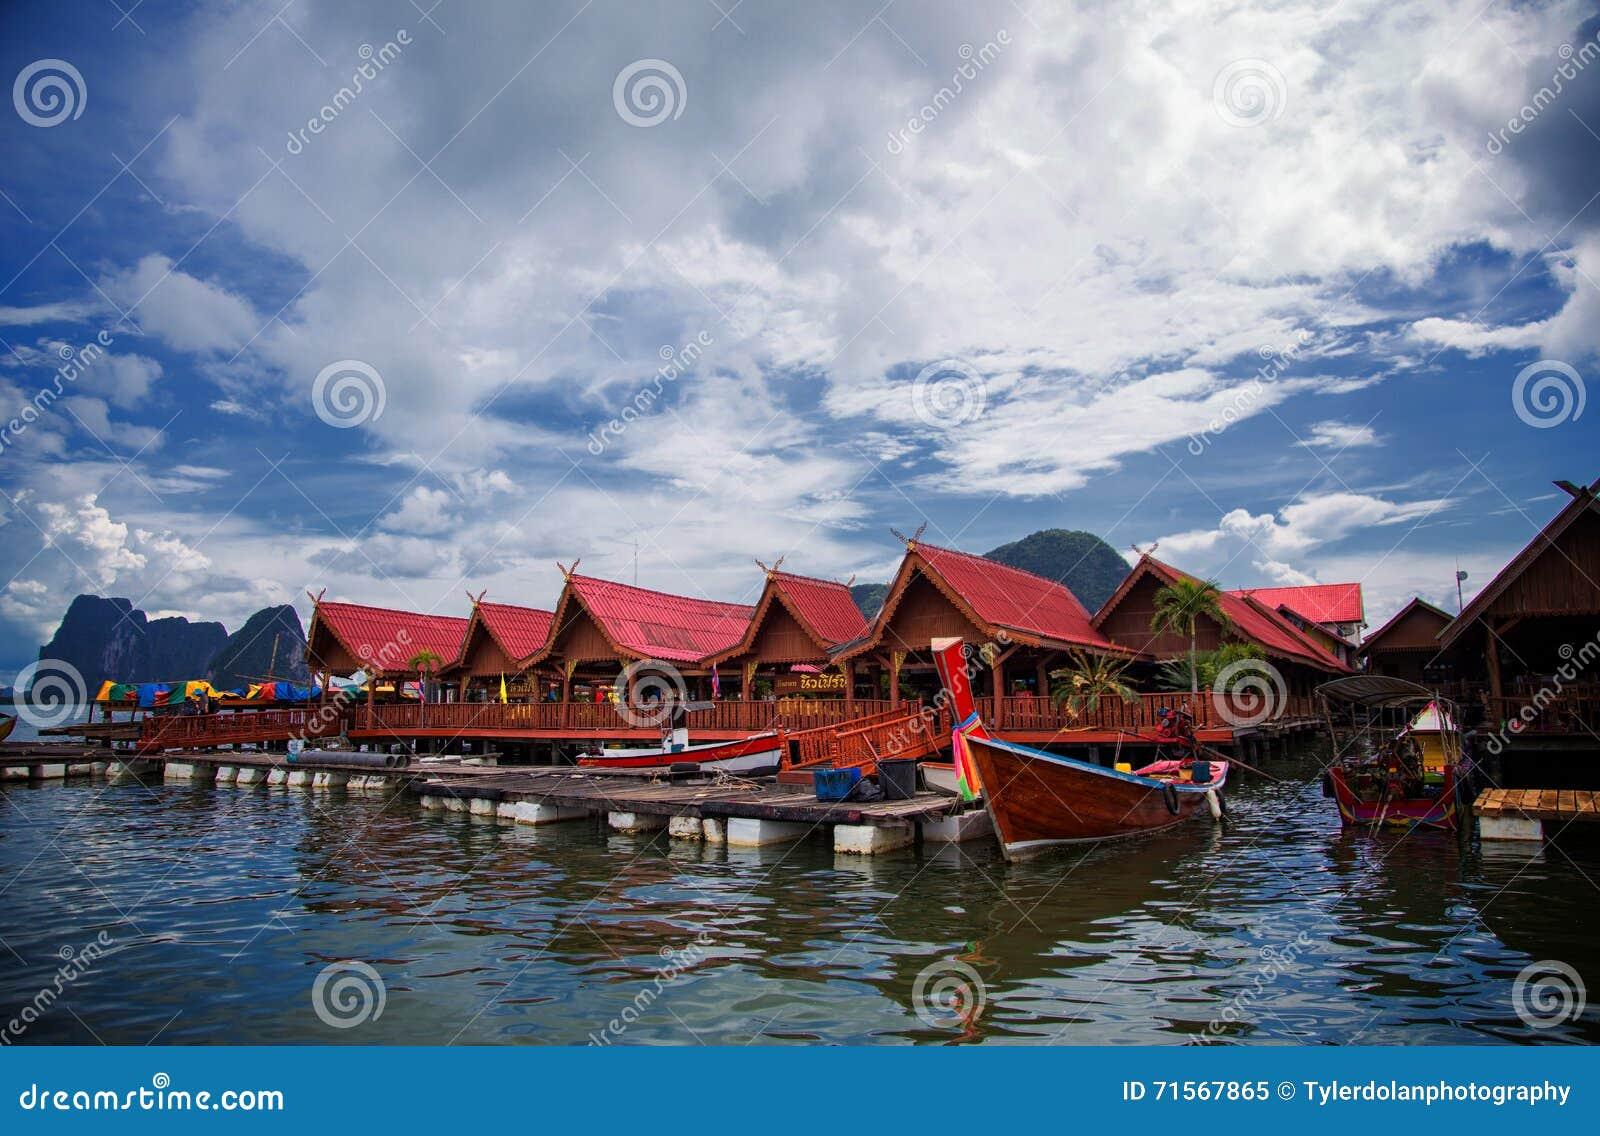 Thailand Floating Market